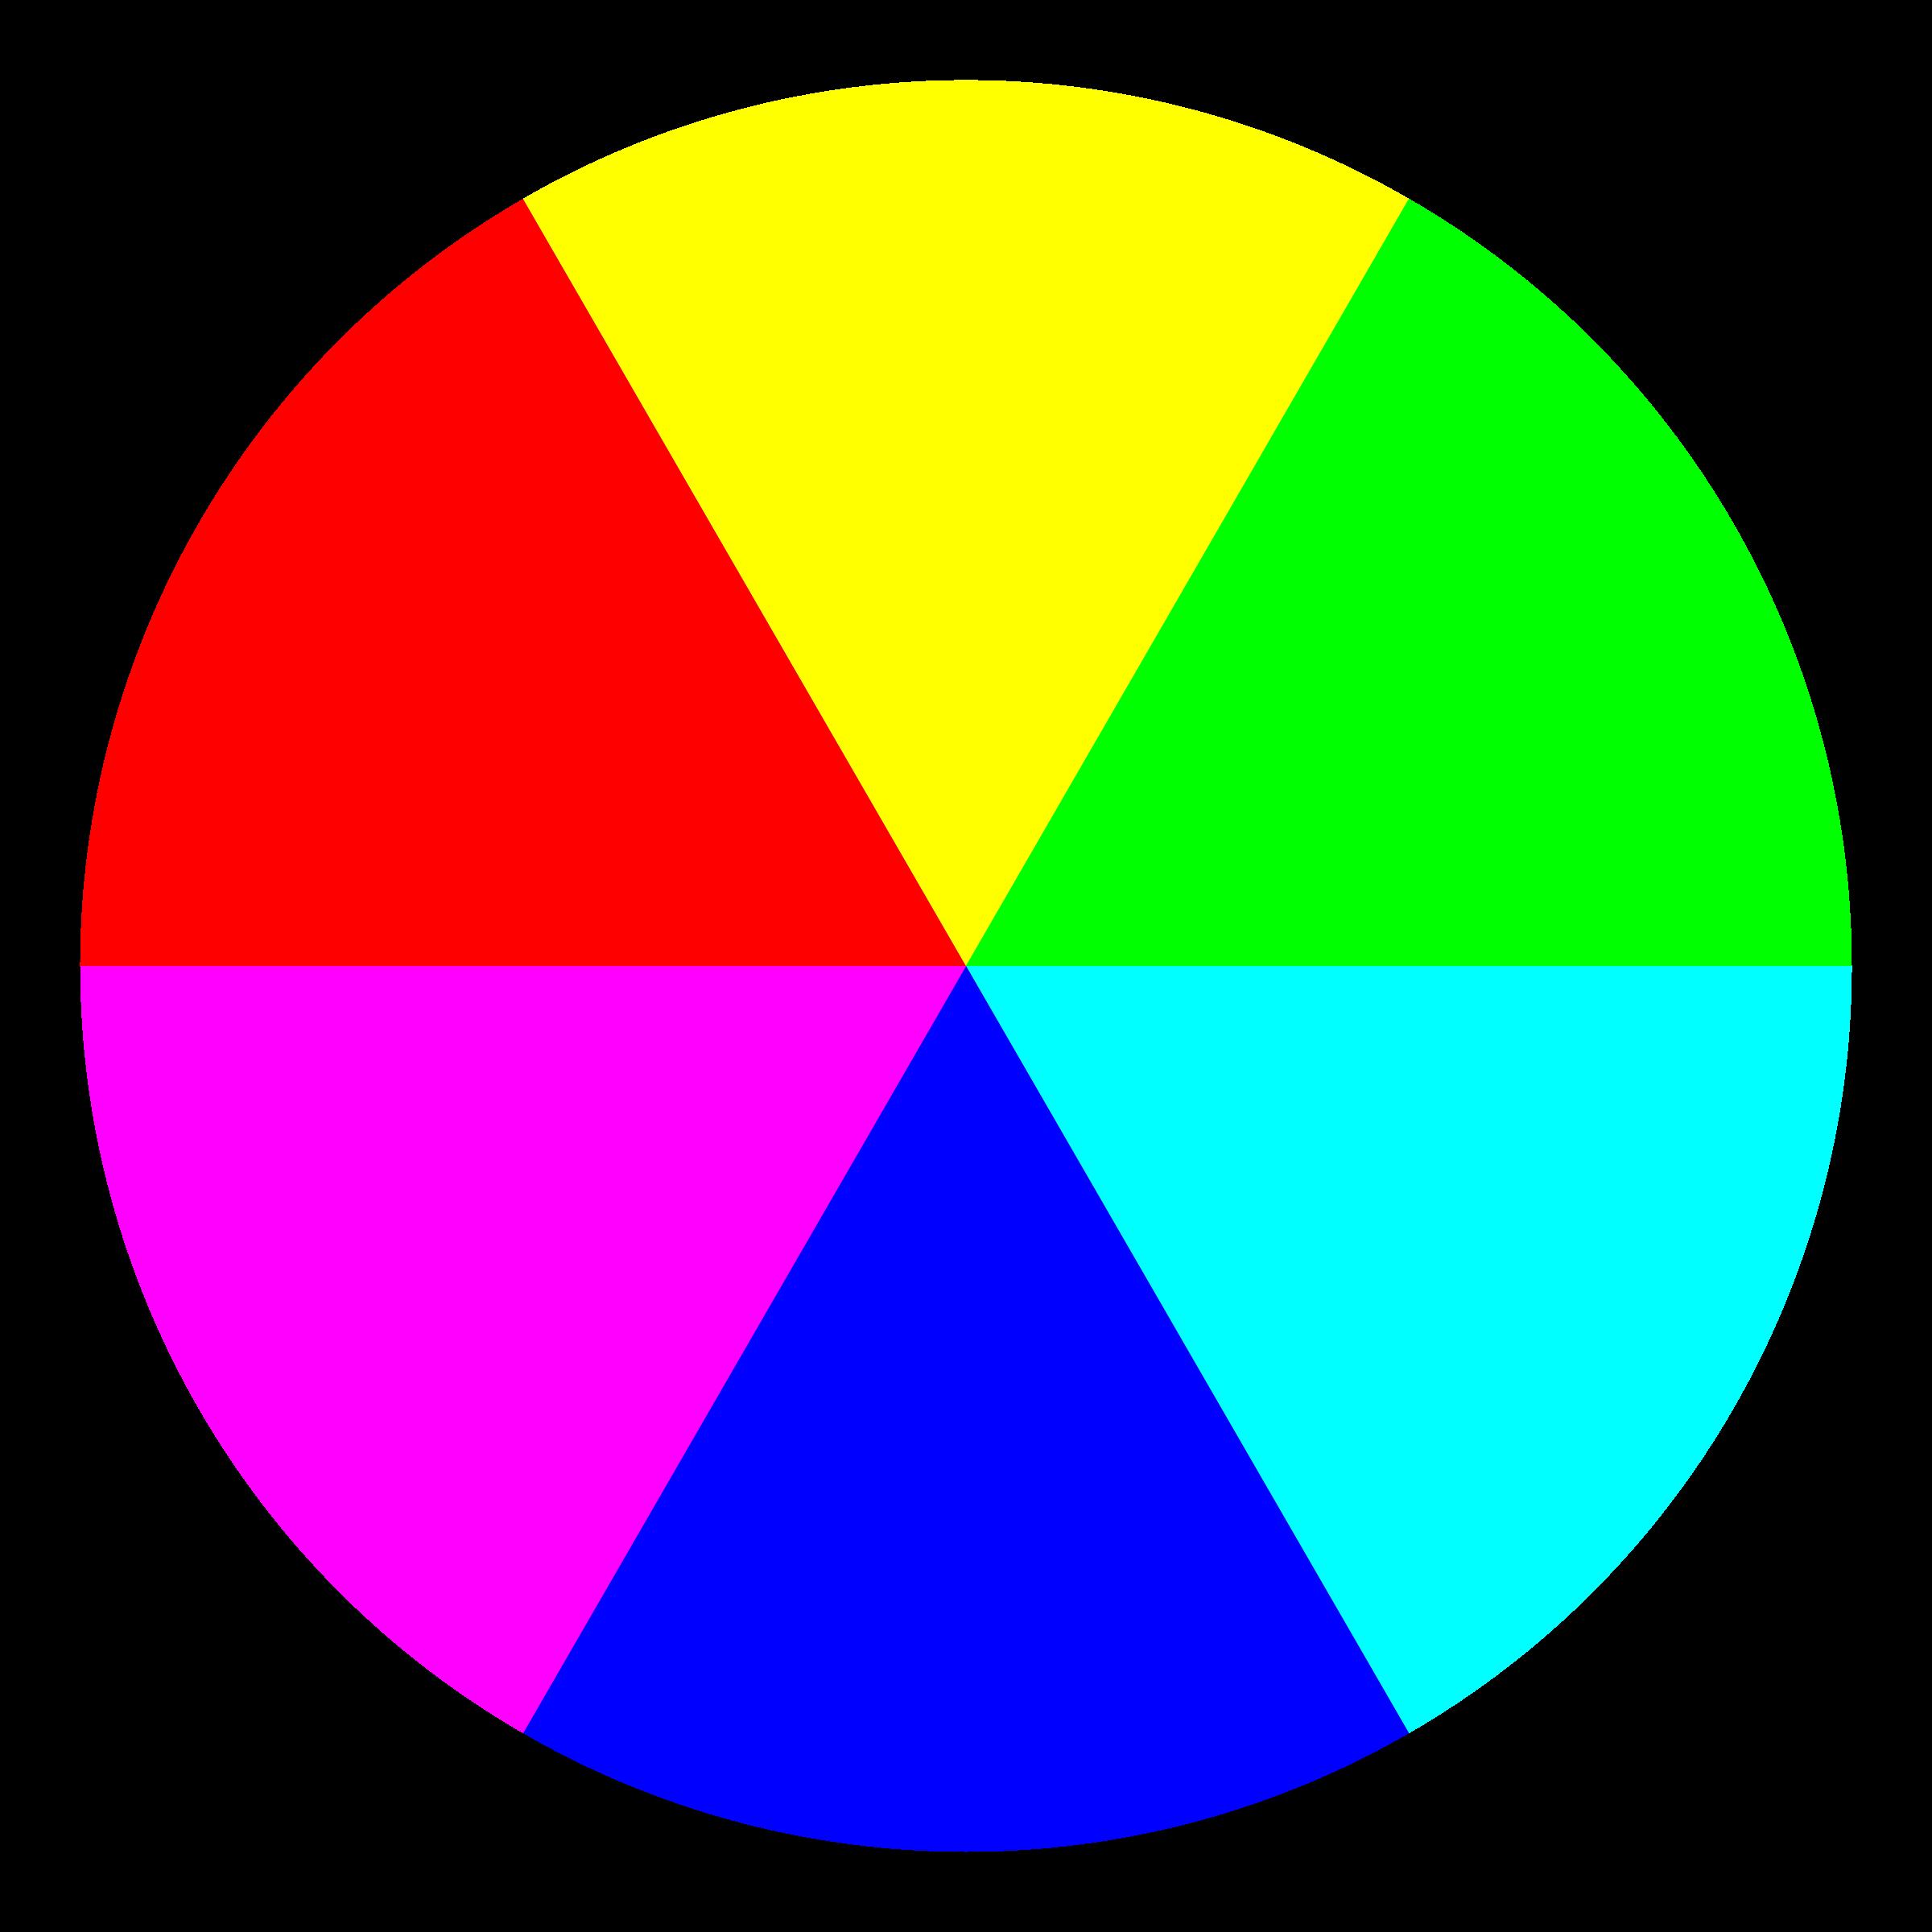 6 color clipart - ClipartFest graphic black and white download